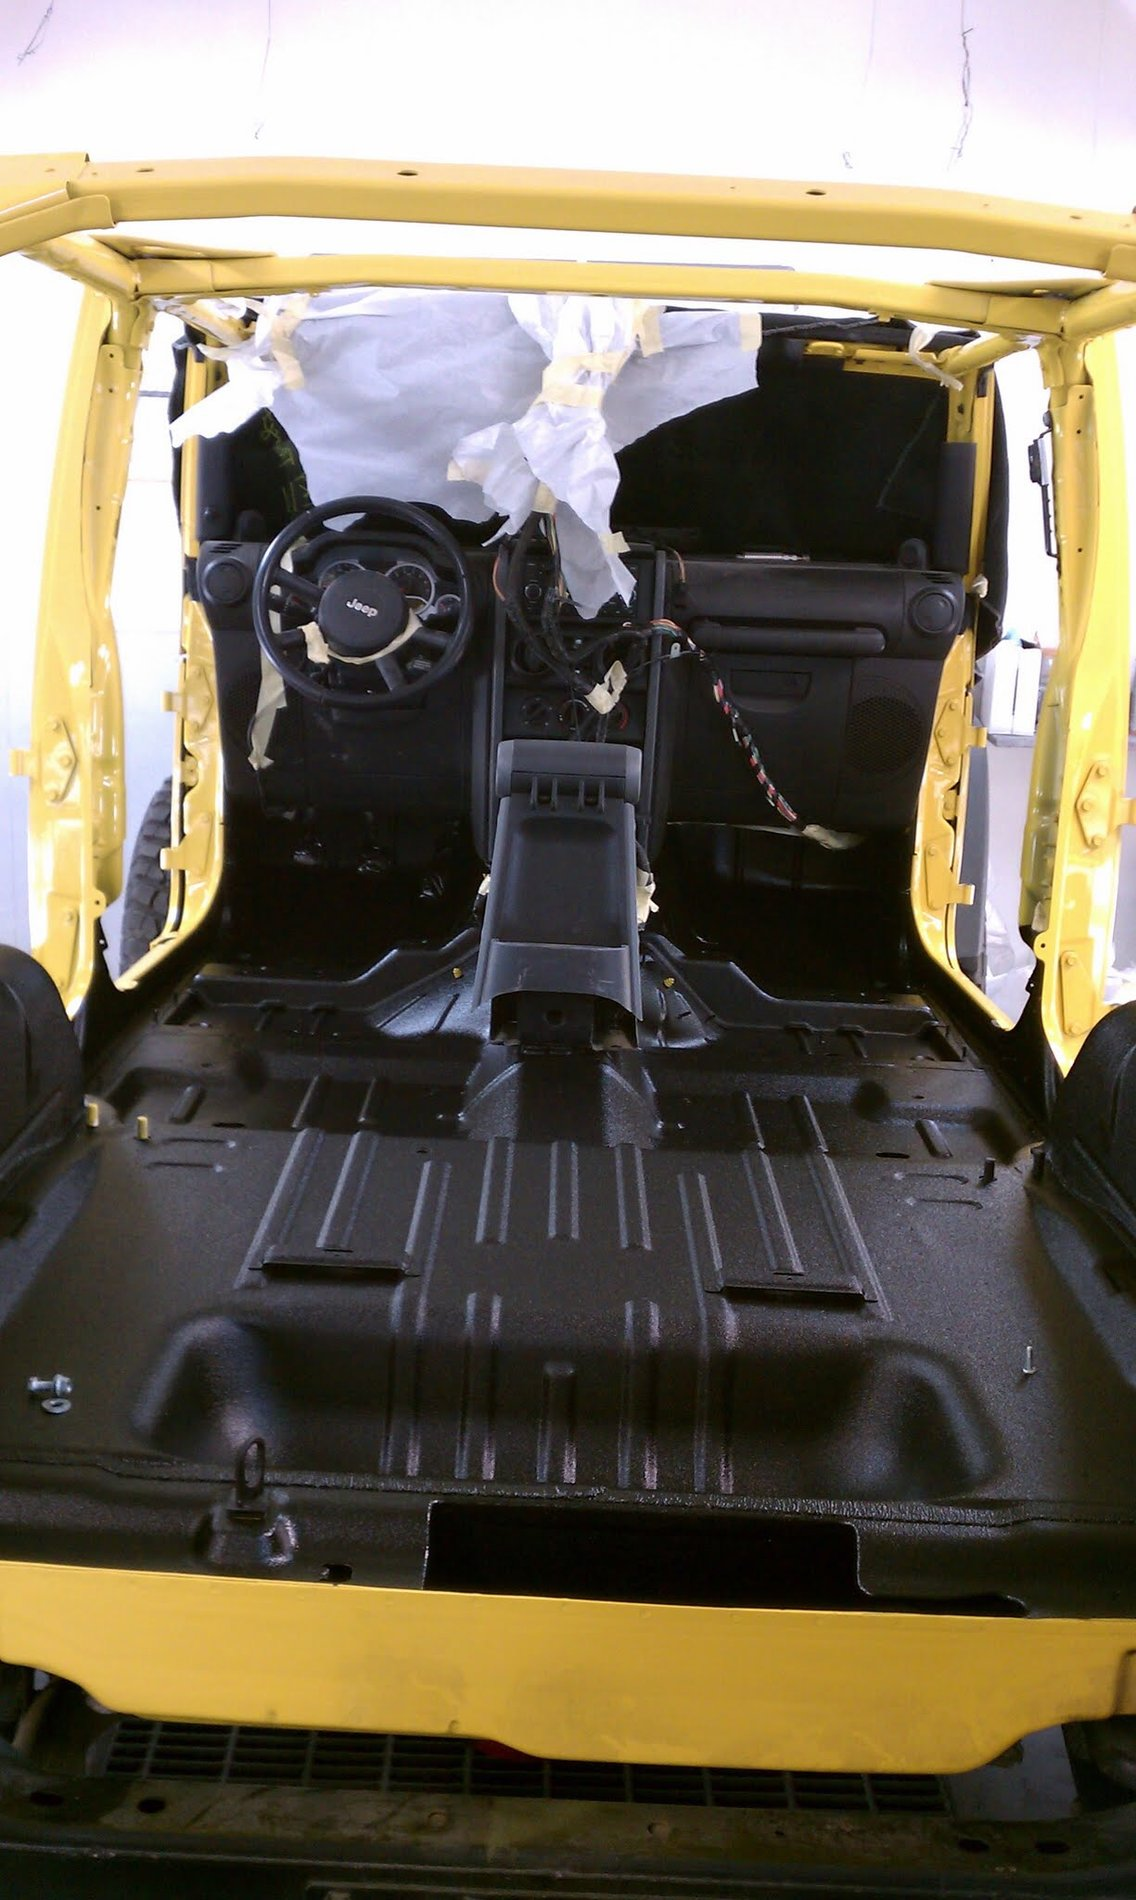 Rhino Liner Interior : rhino, liner, interior, Floor, Carpet, Removal, Interior, Rhino, Spray, Lining, 2018+, Wrangler, Forums, Rubicon,, Sahara,, Sport,, Unlimited, JLwranglerforums.com